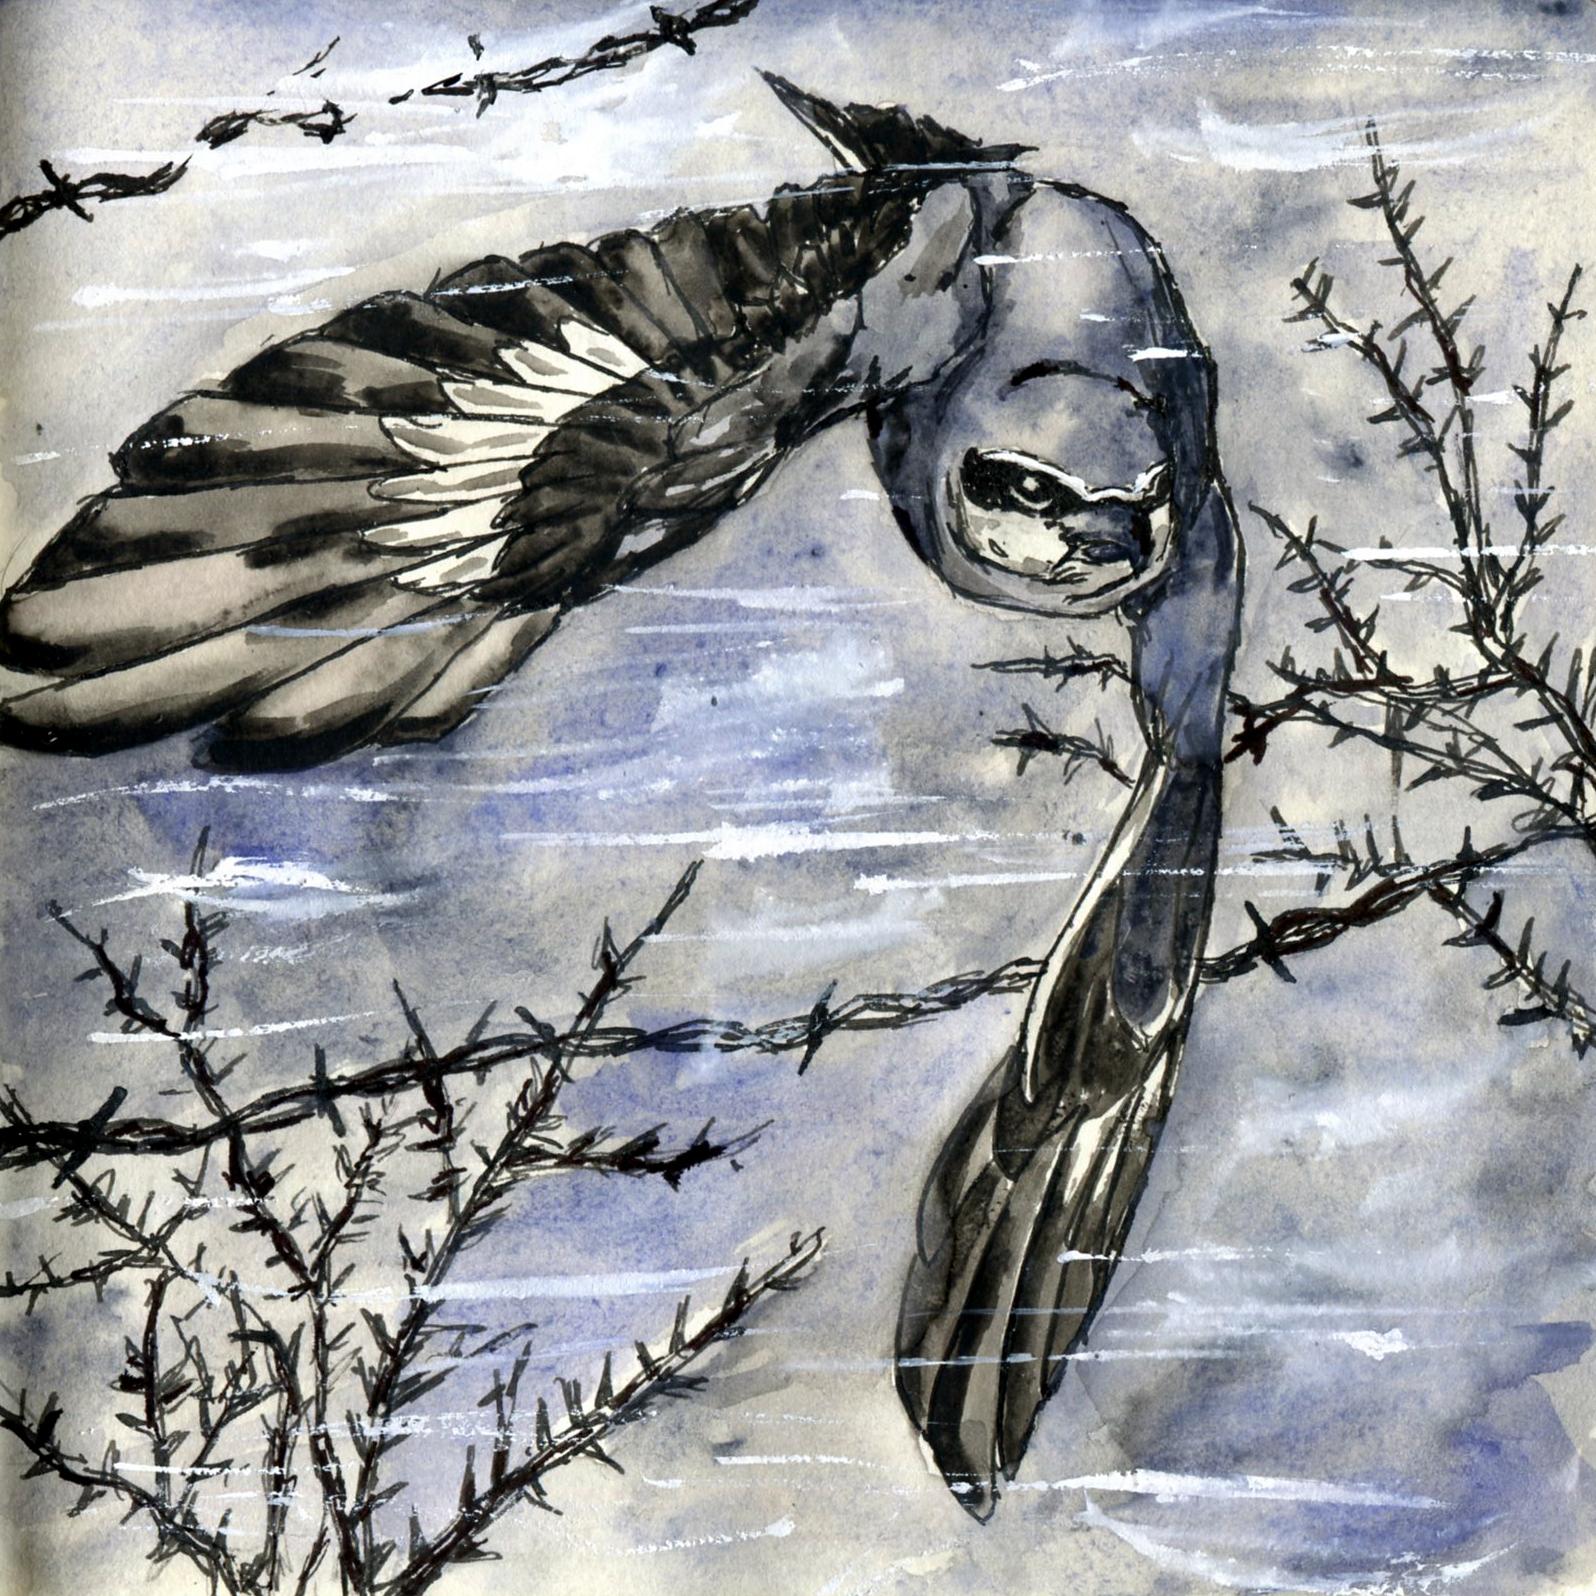 295. Northern Shrike